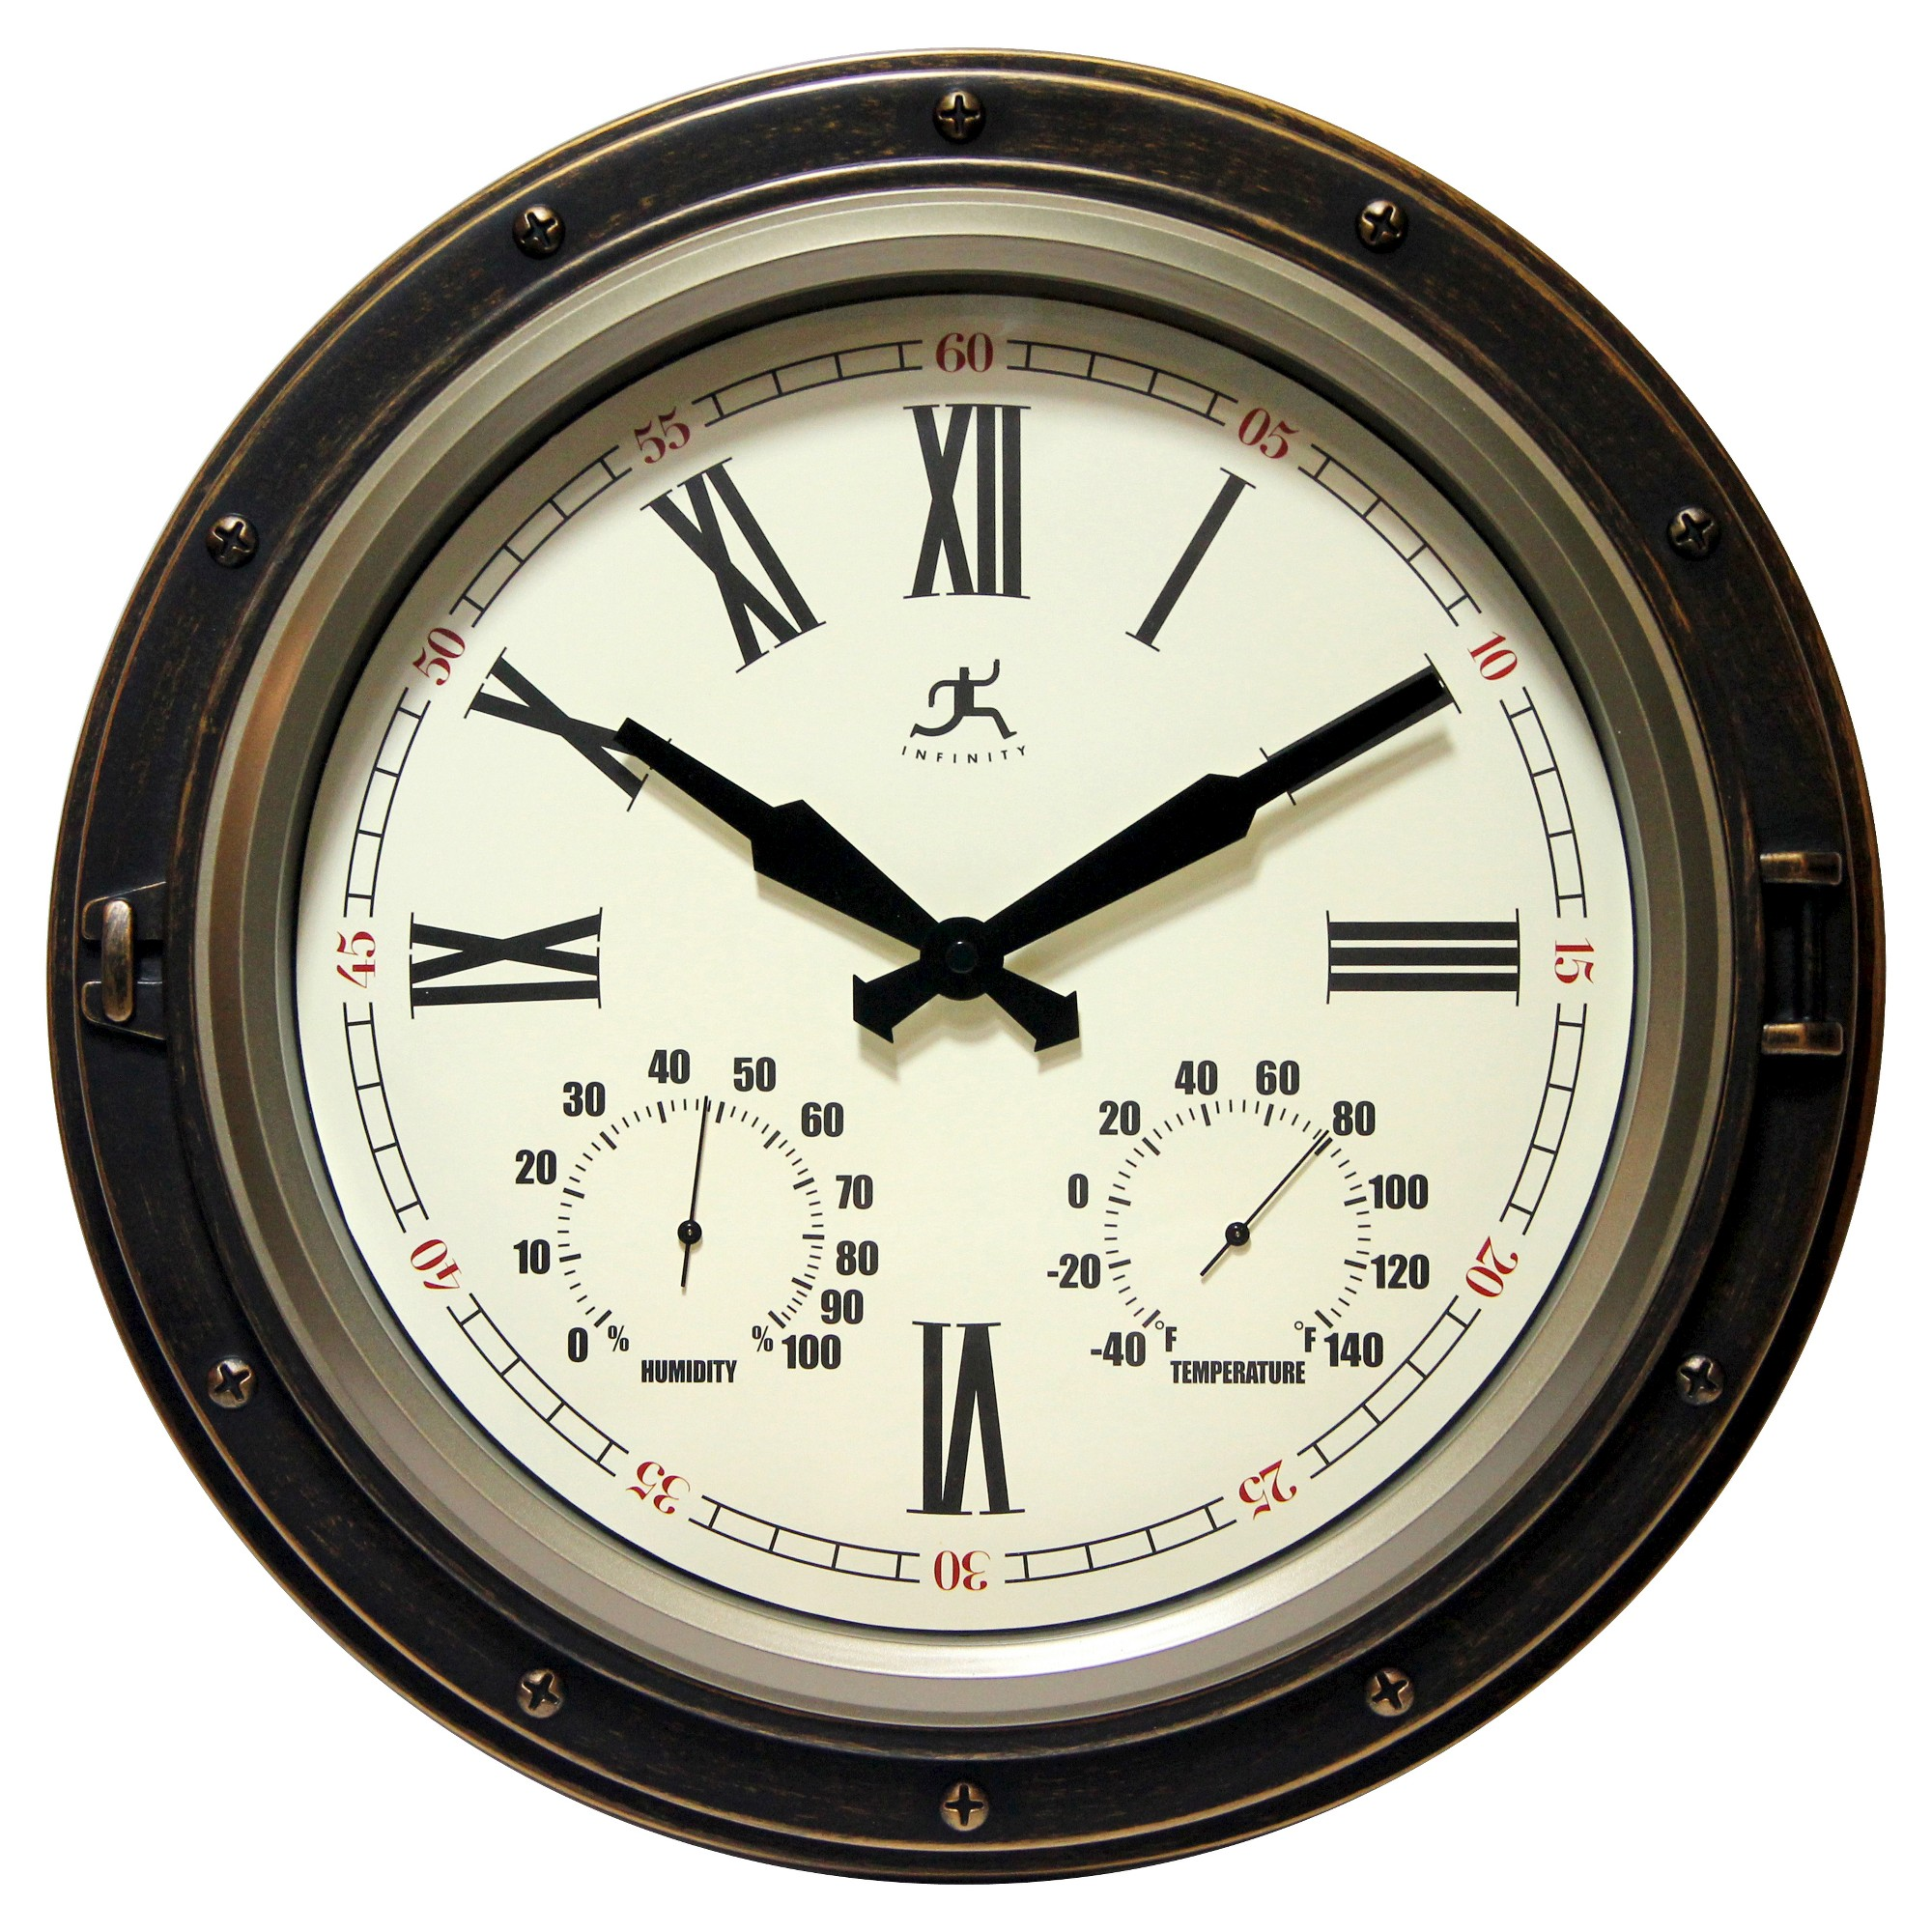 Forecaster Decorative Wall Clock Bronze - Infinity Instruments